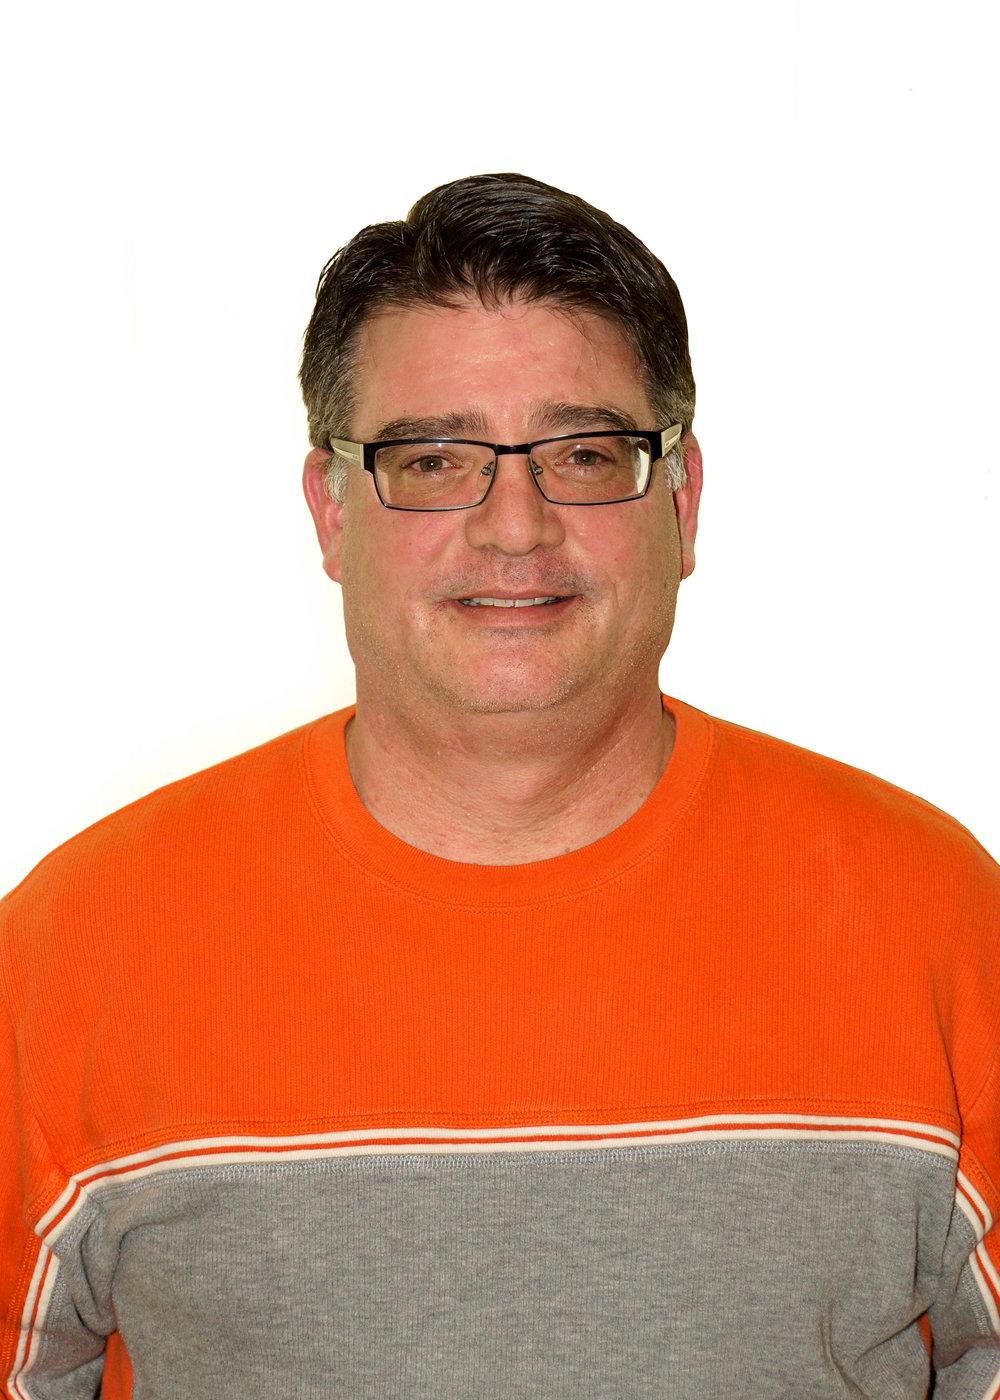 Eric Fowle